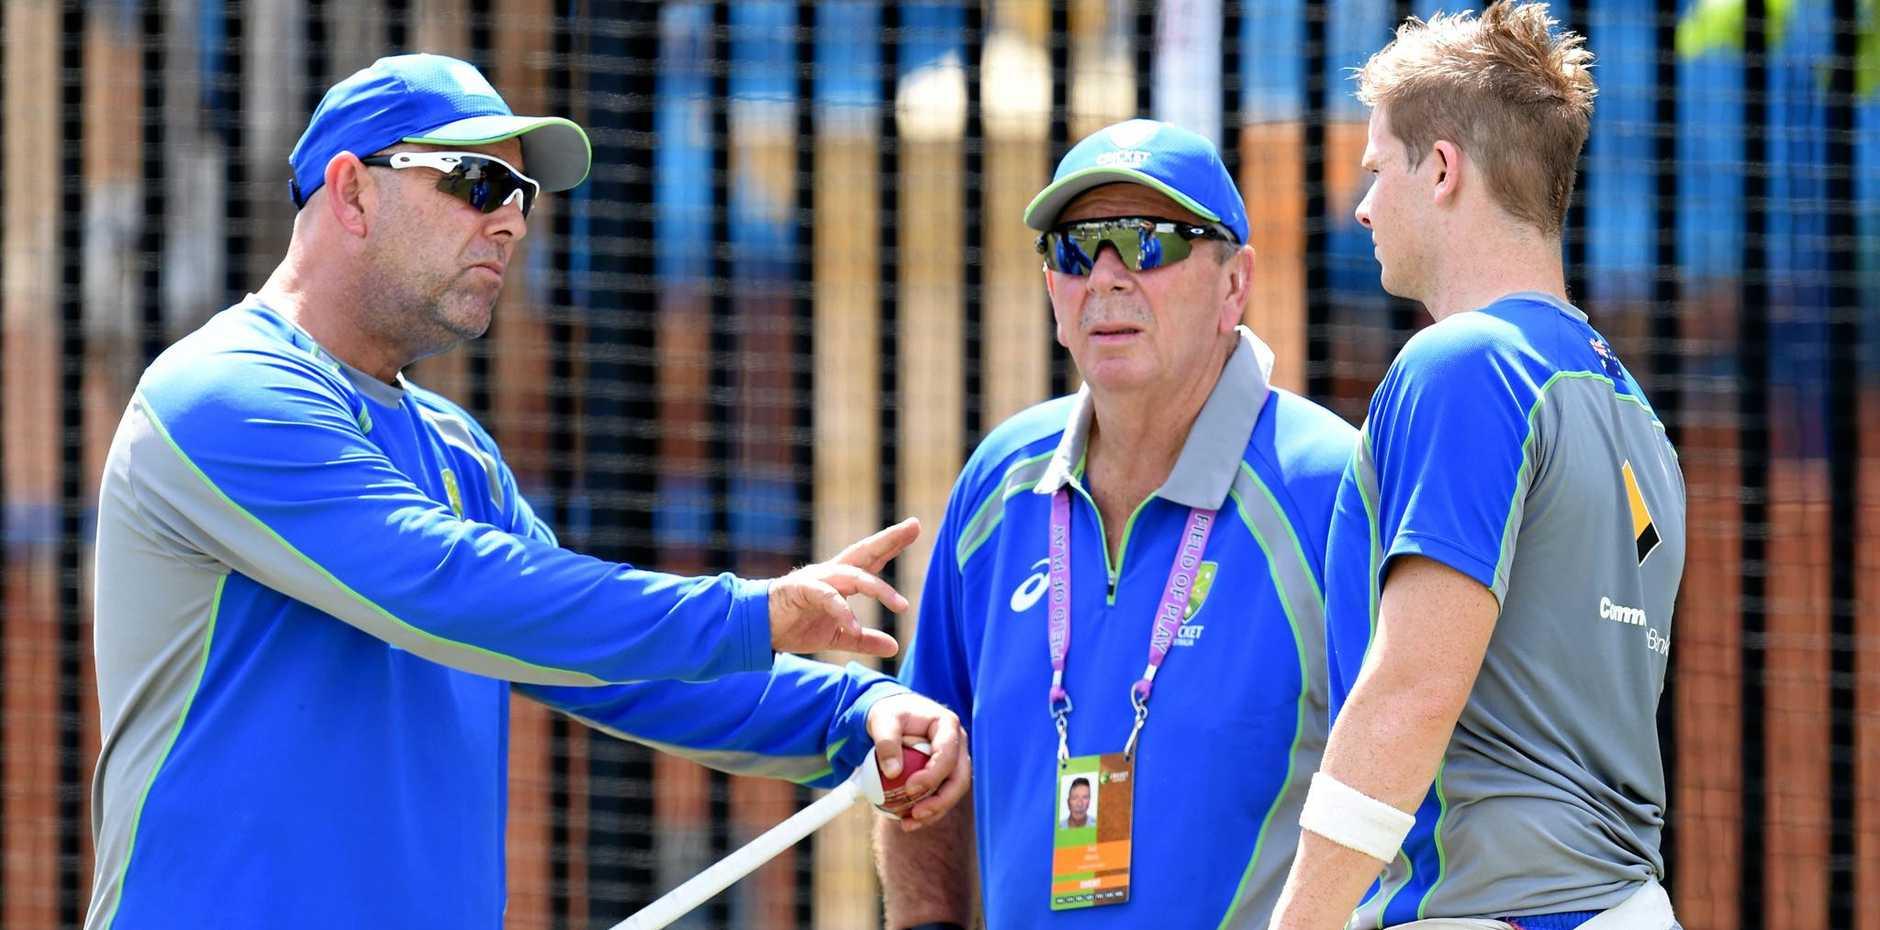 Australian selector Rod Marsh (centre) with coach Darren Lehmann and captain Steve Smith during a team net session.